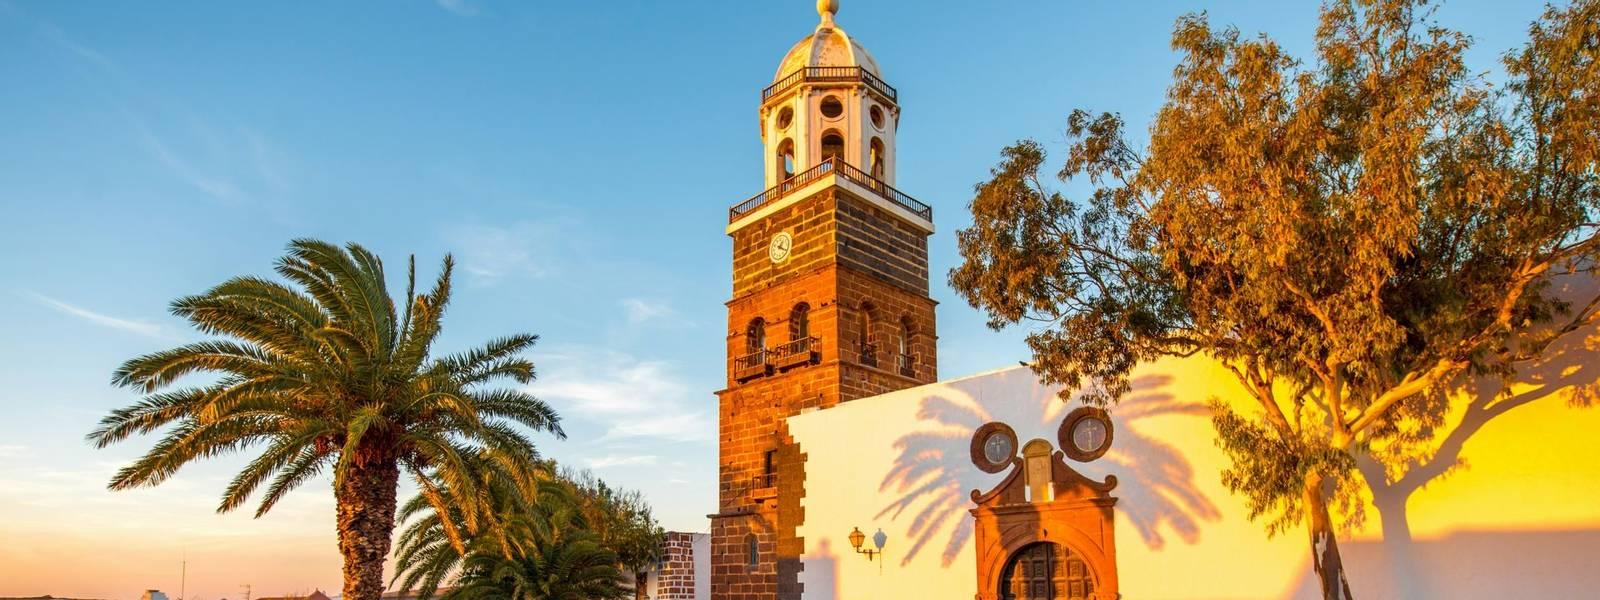 Teguise village on Lanzarote island